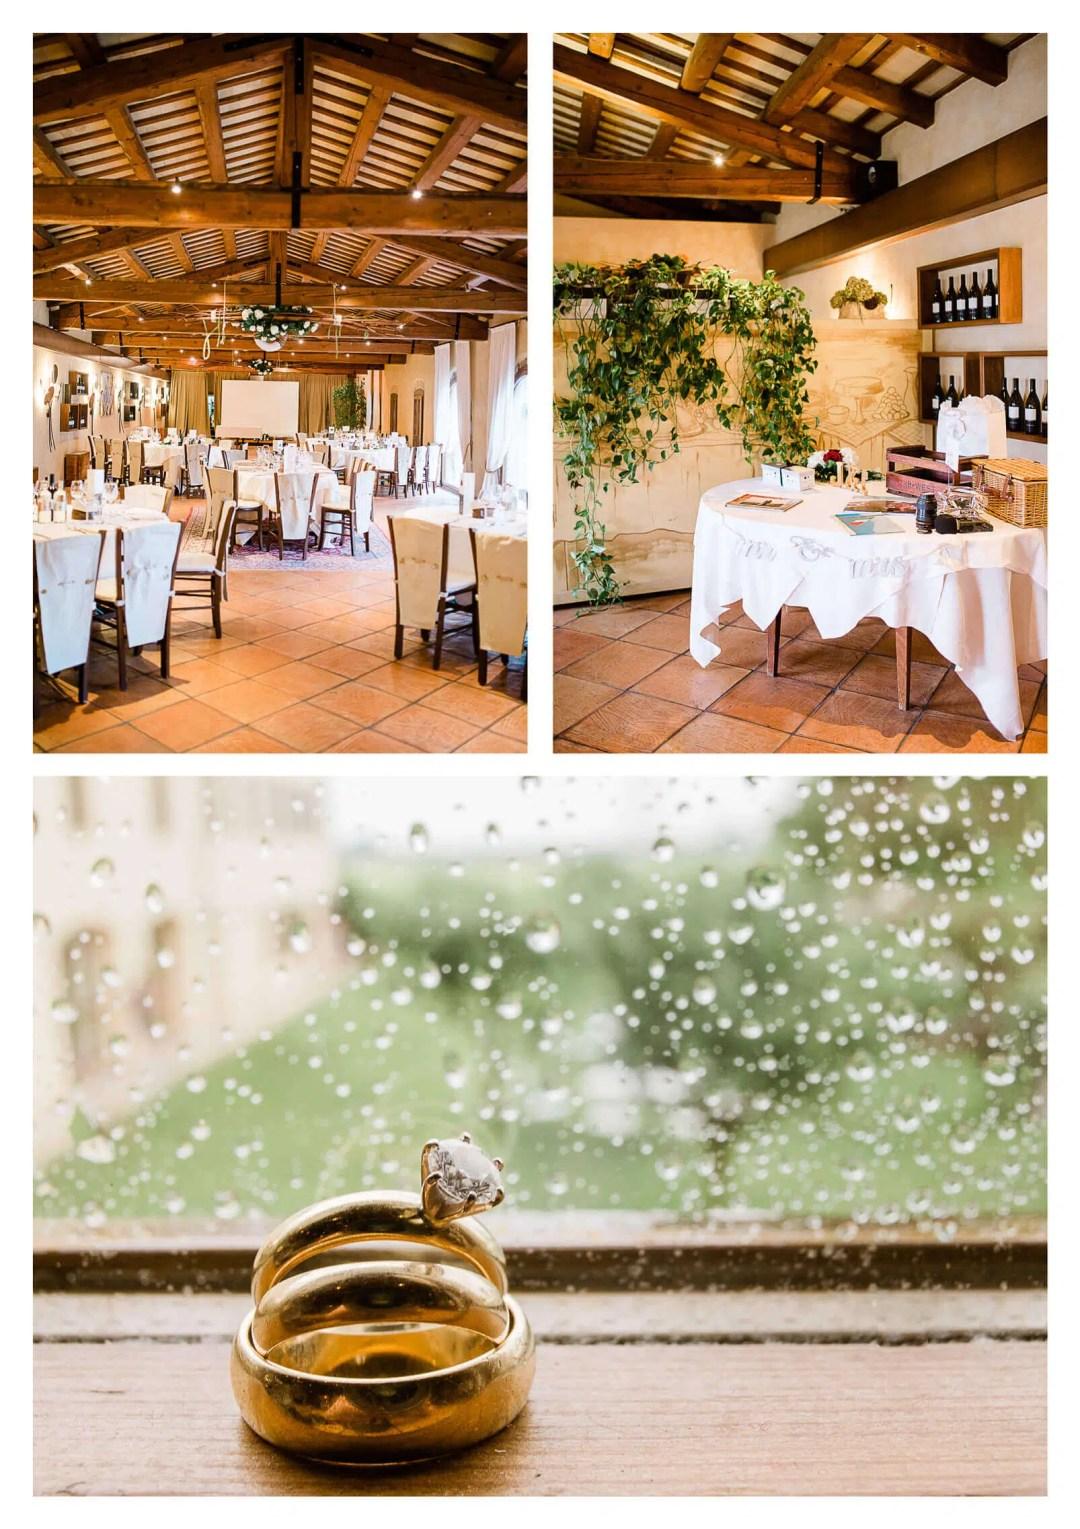 Fossa Mala wedding breakfast decor for reception | Pordenone destination photographer